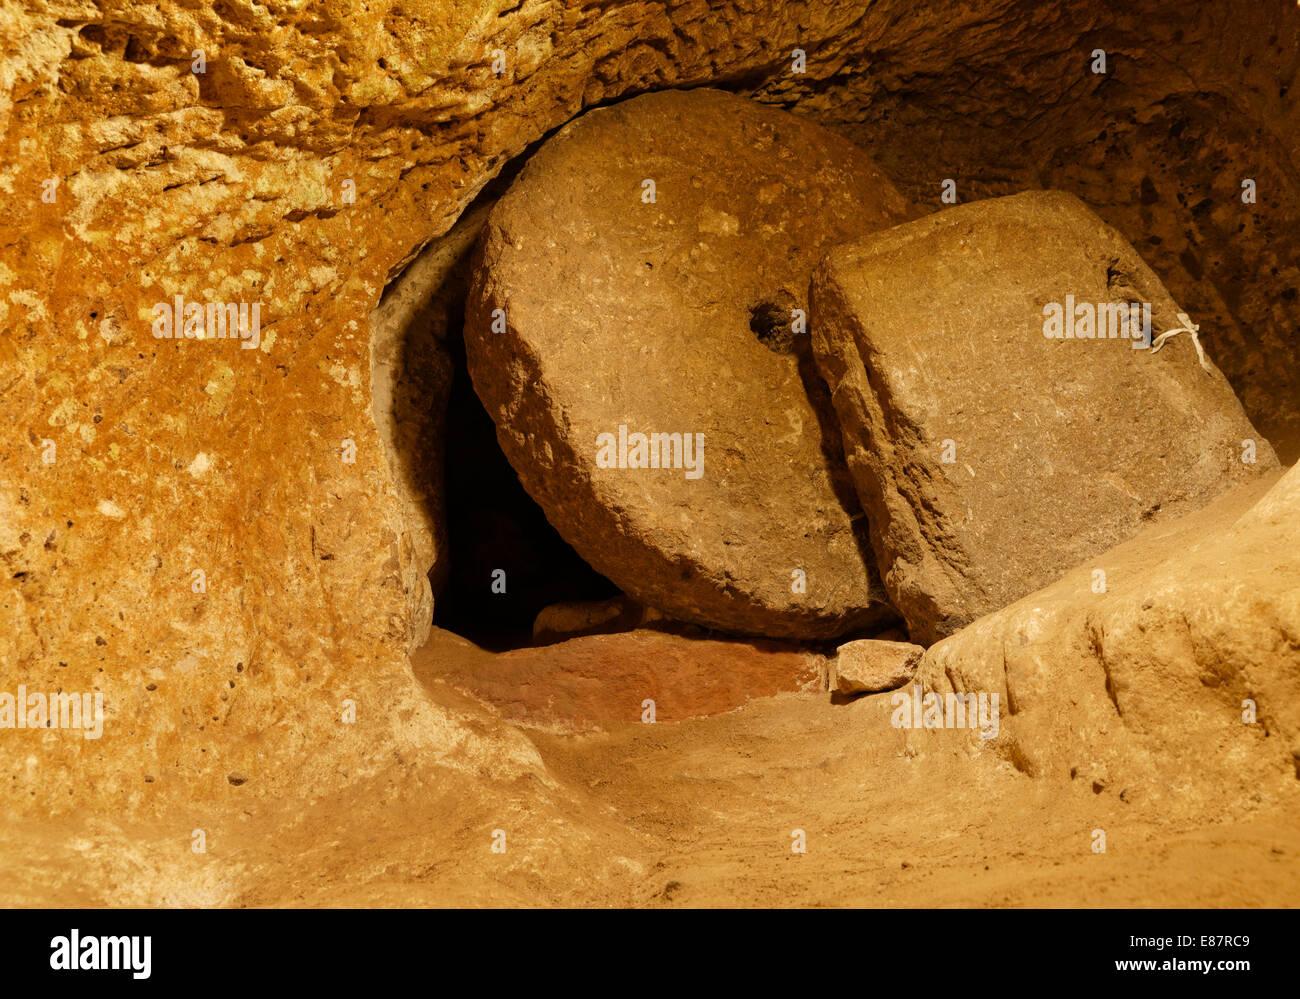 Door with a rolling stone, Derinkuyu Underground City, Nevşehir Province, Cappadocia, Central Anatolia Region, Anatolia, - Stock Image